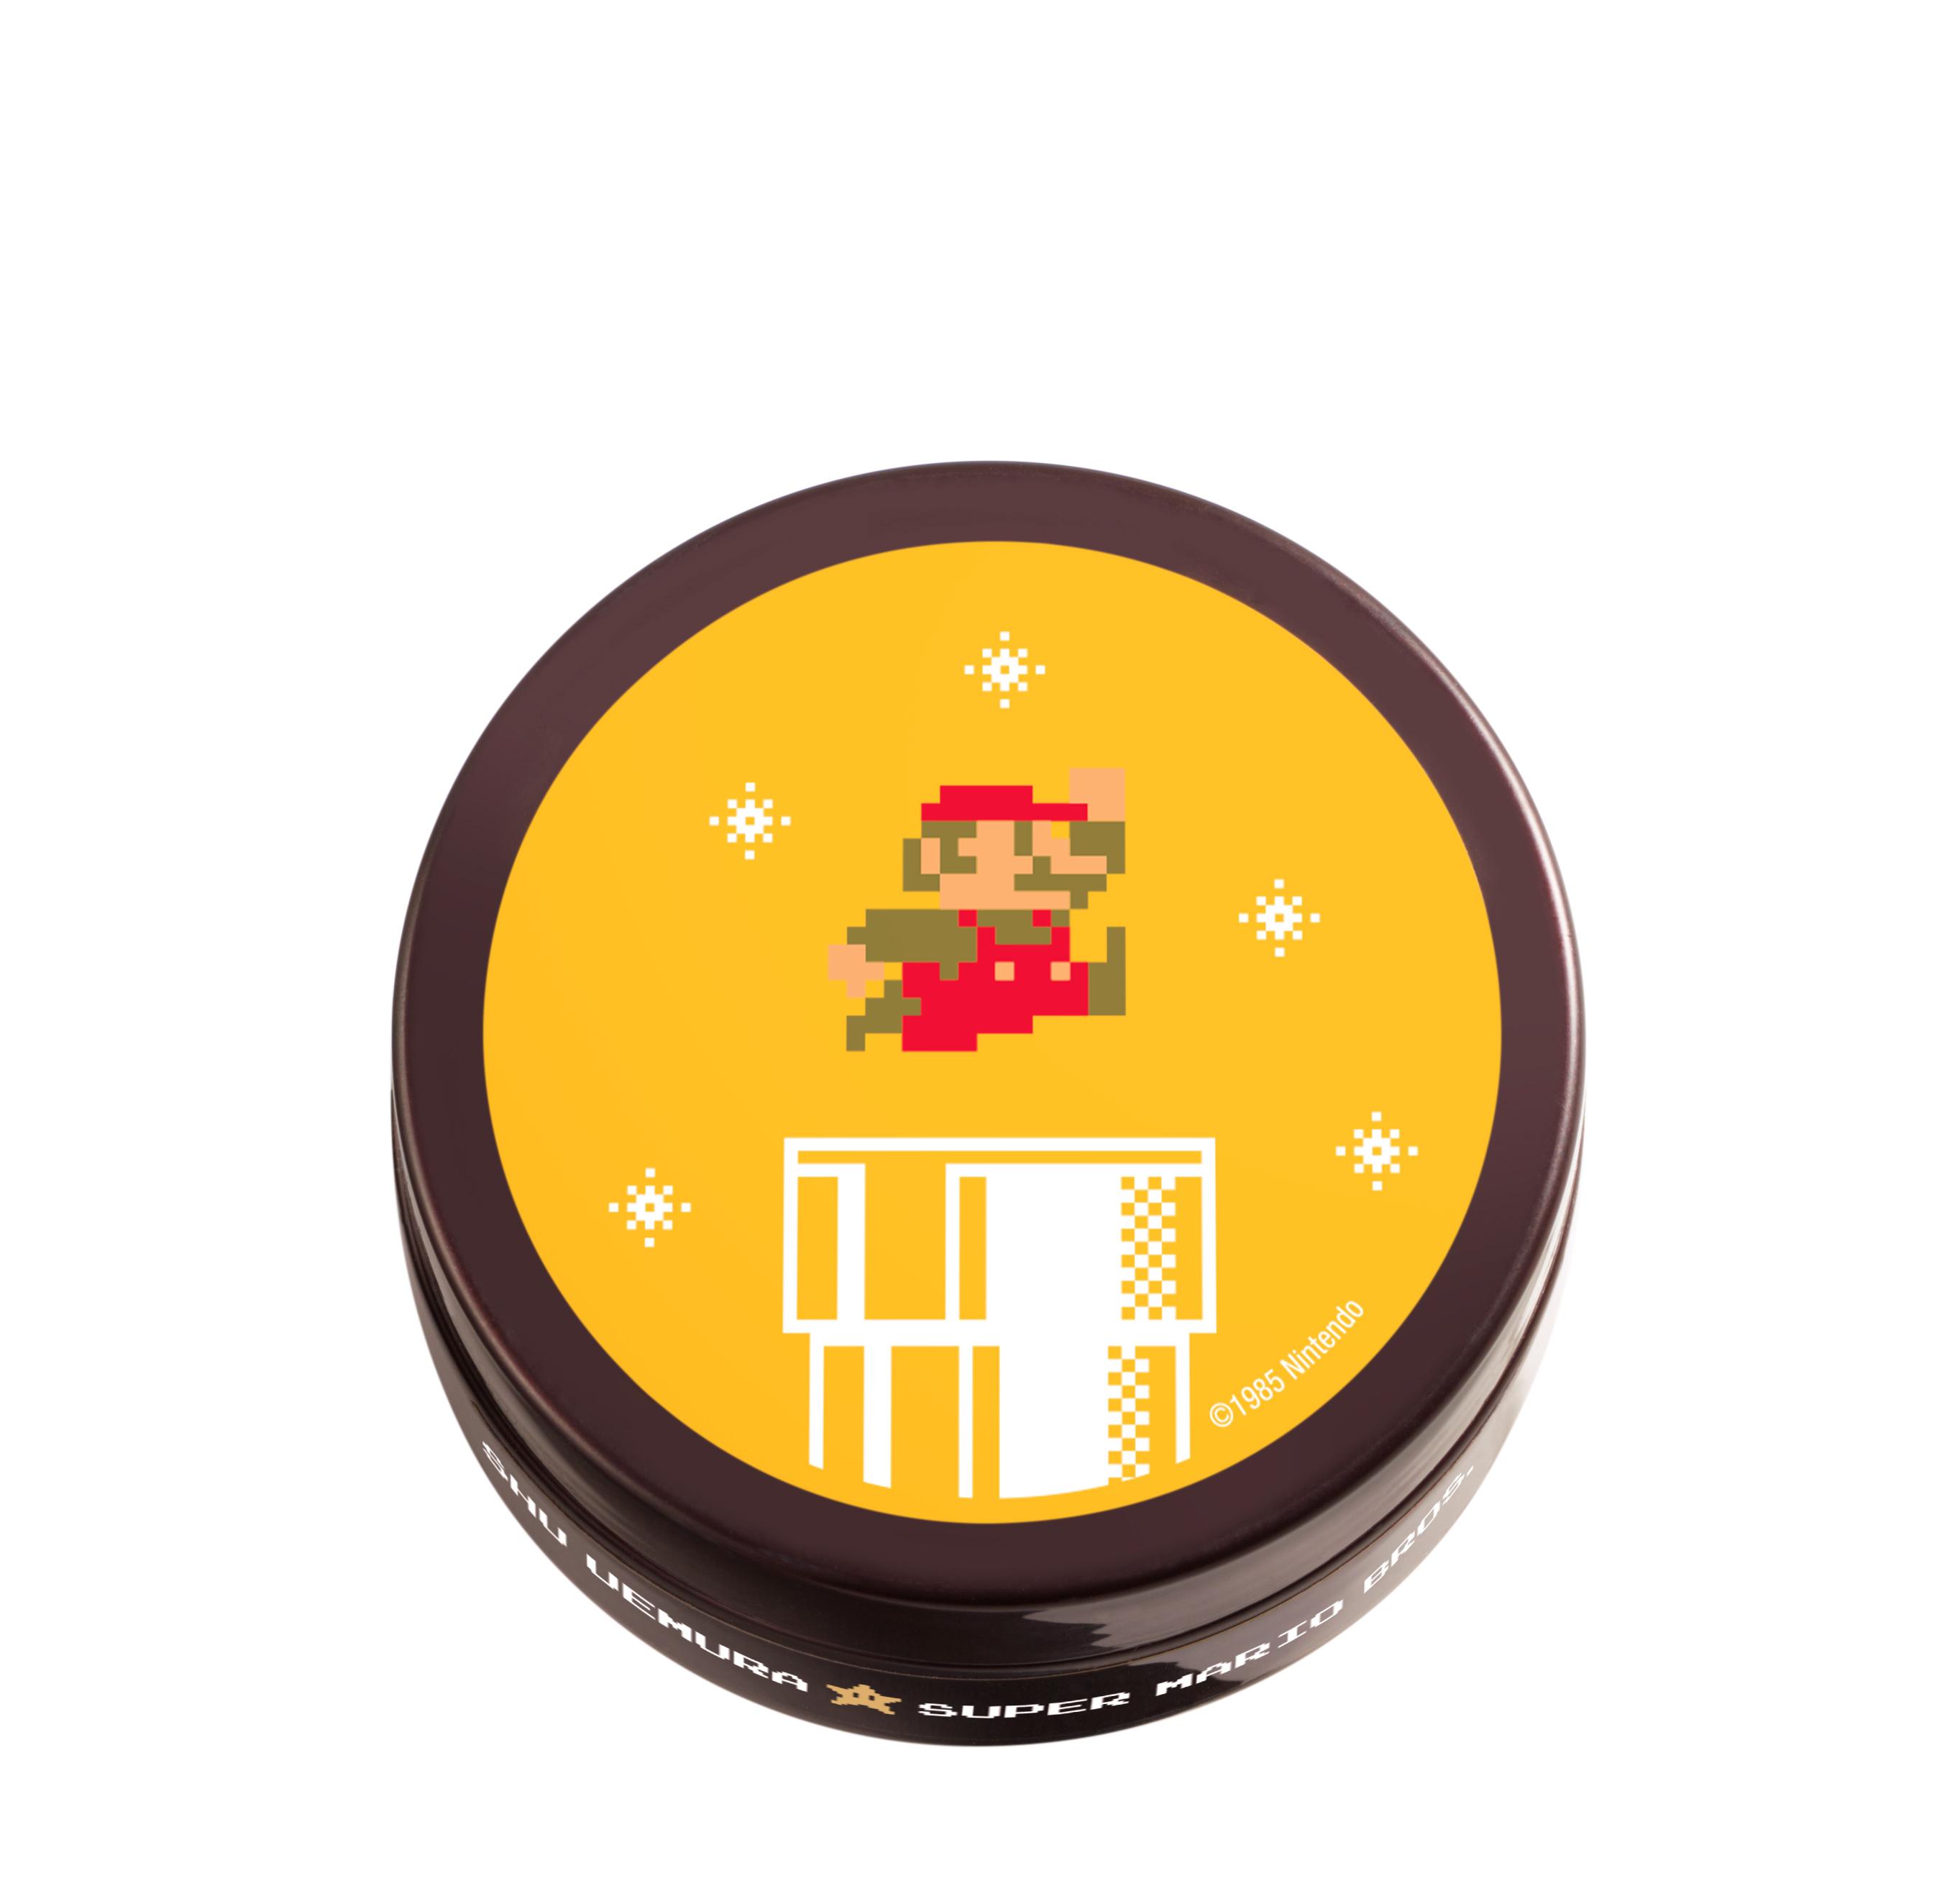 Shu Uemura x Super Mario Bros. holiday collection